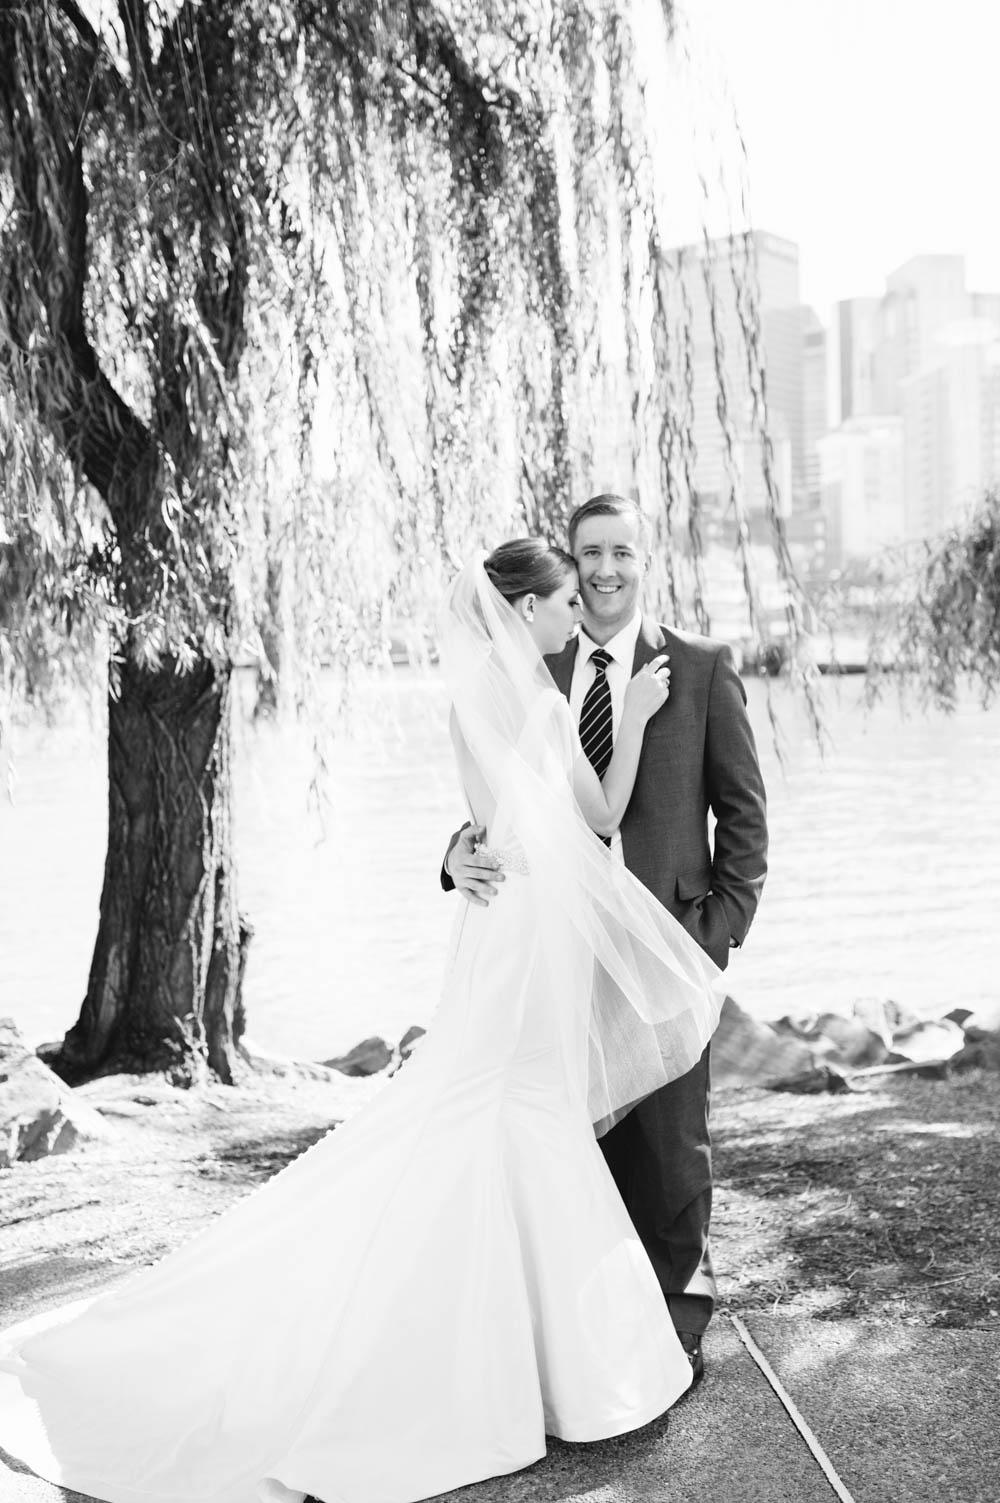 wintergarden-wedding-pittsburgh-79.jpg